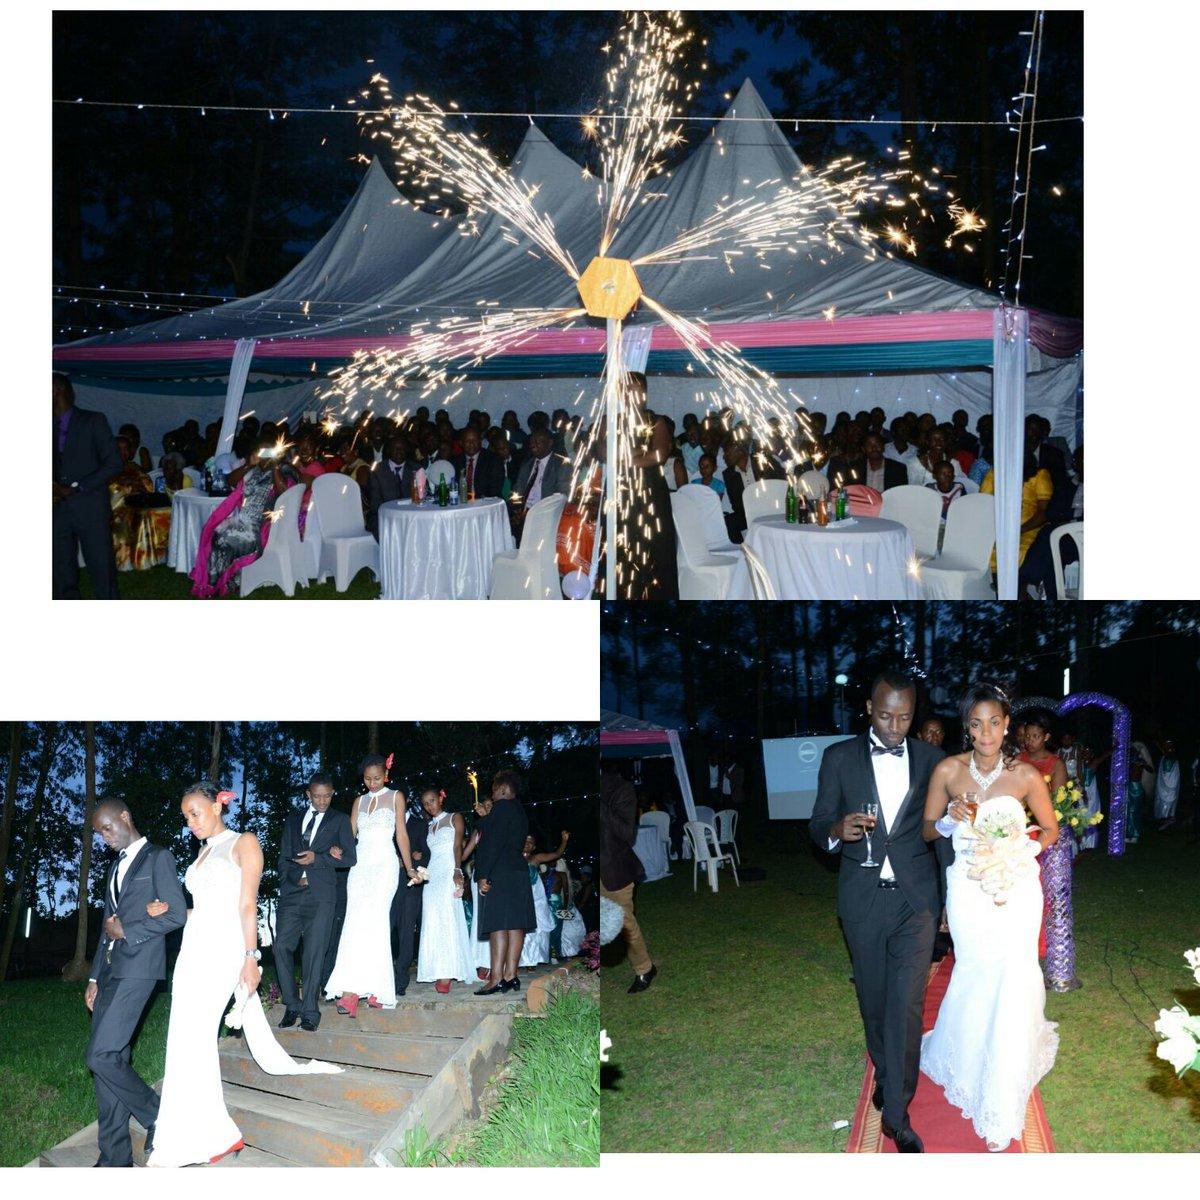 Umuhuza park wedding umuhuzapark twitter 0 replies 2 retweets 1 like junglespirit Gallery